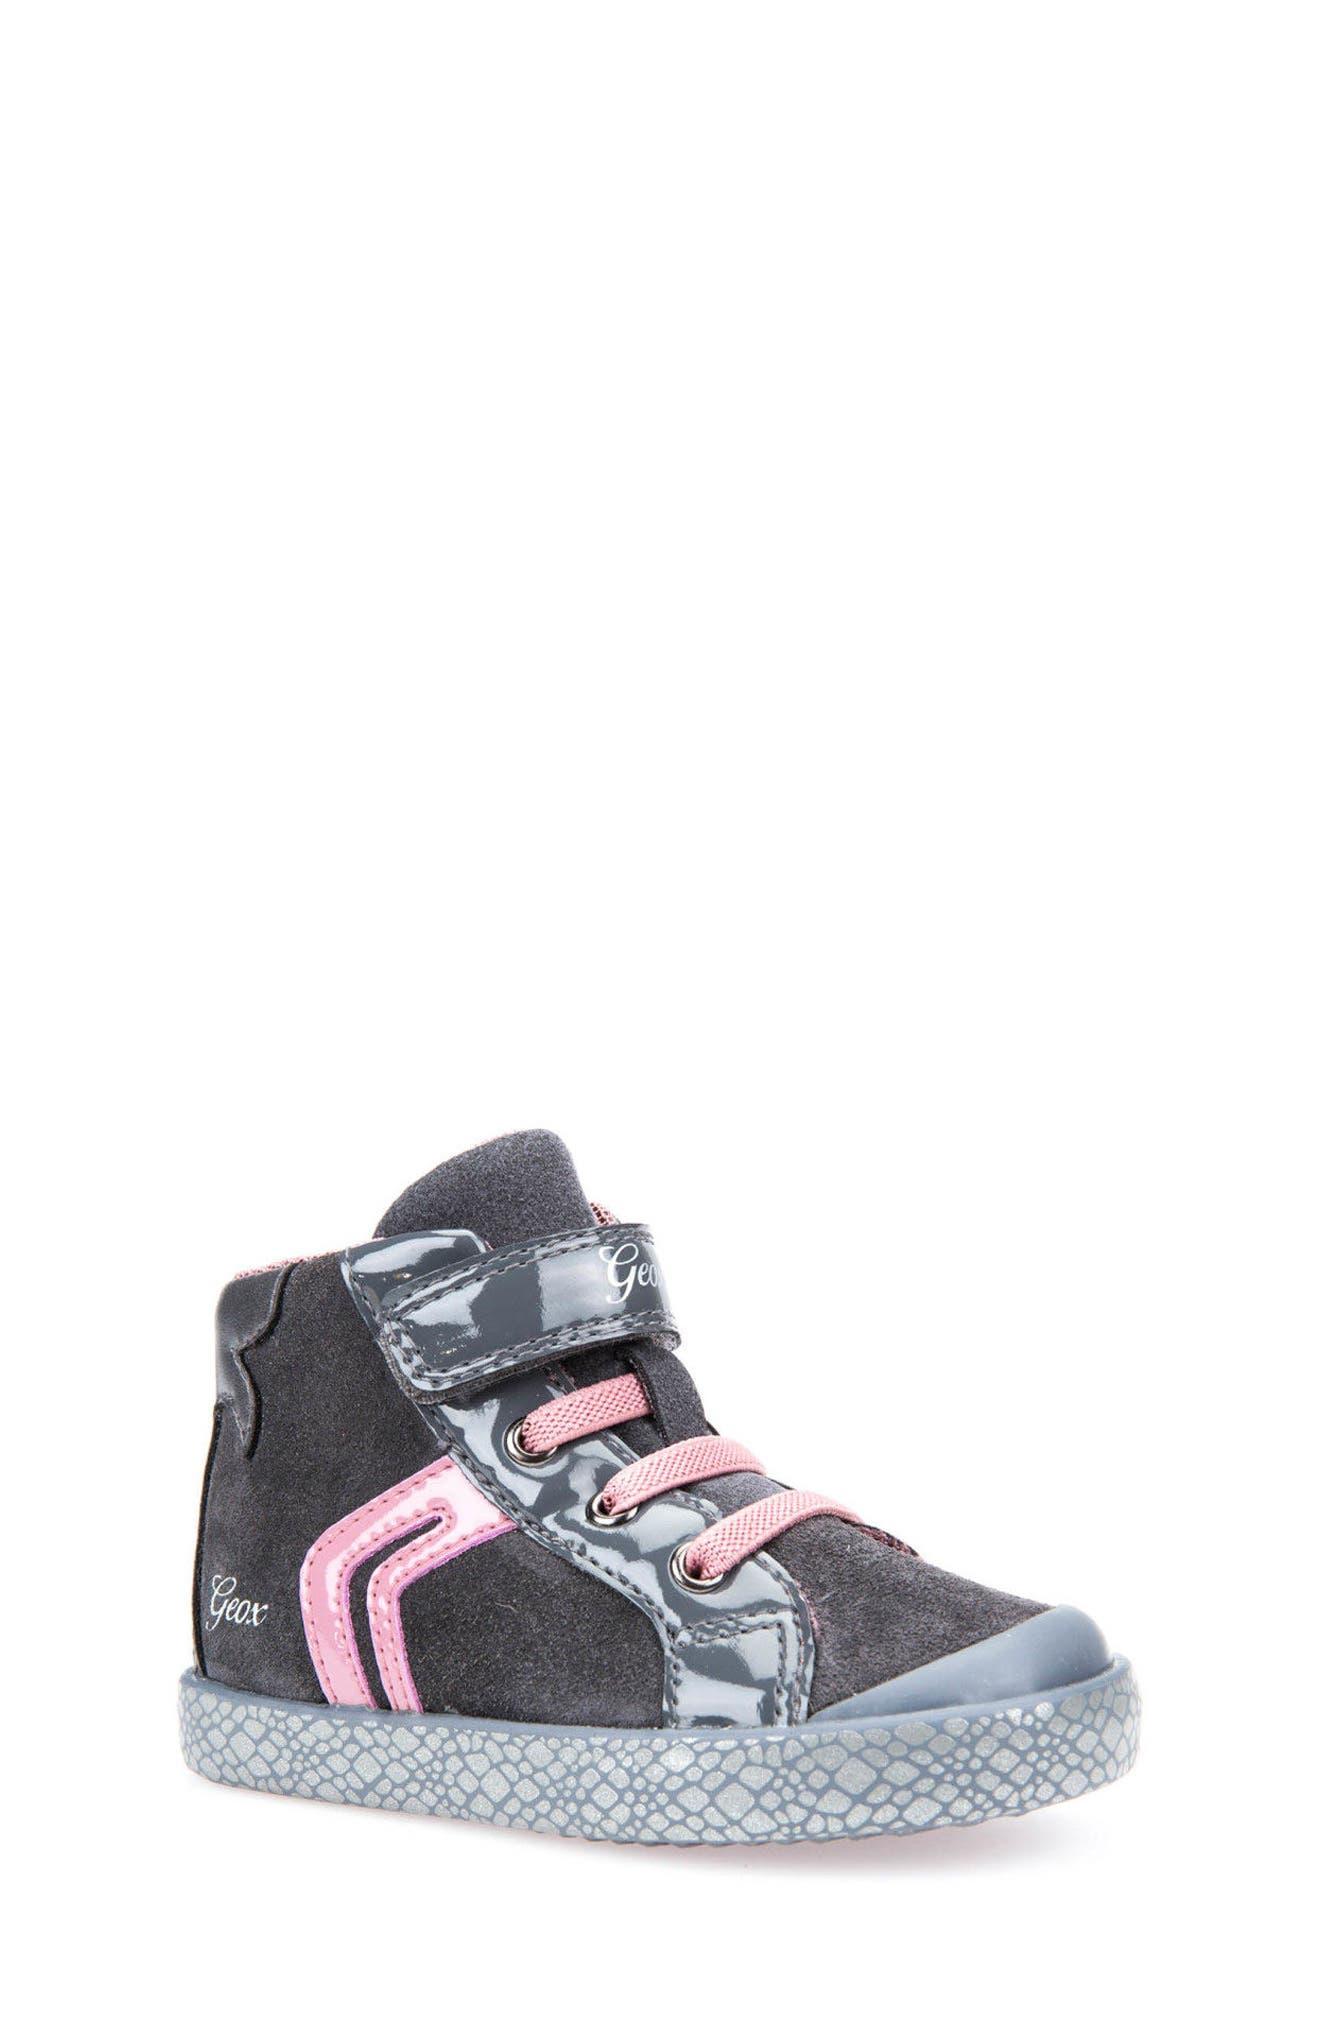 Geox Kiwi Girl High Top Sneaker (Walker & Toddler)